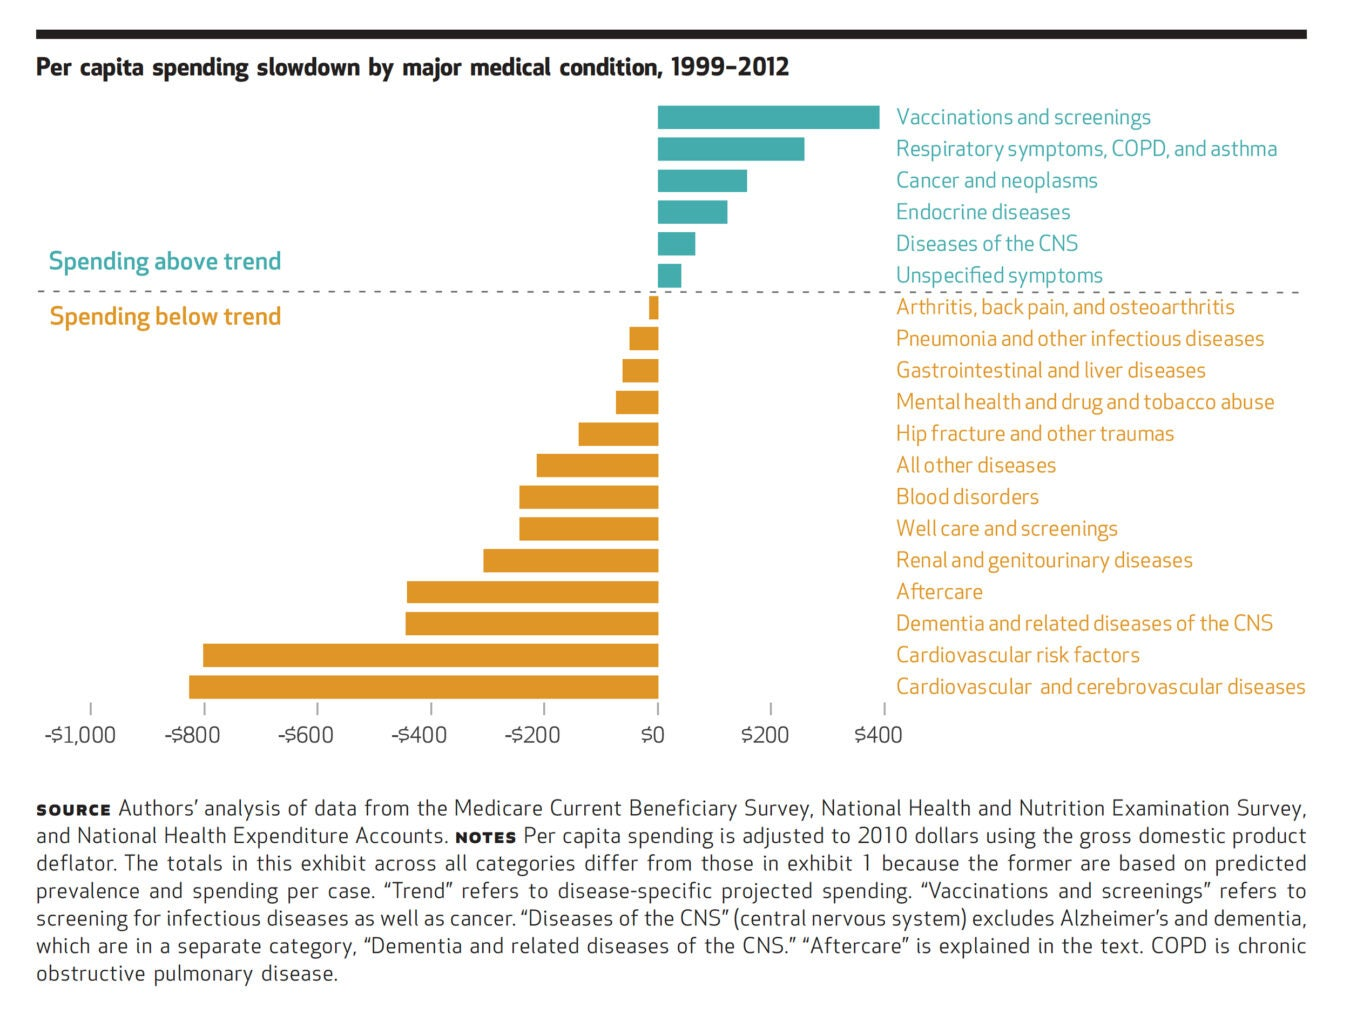 Per Capita Spending Slowdown by Major Medical Condition 1992-2012